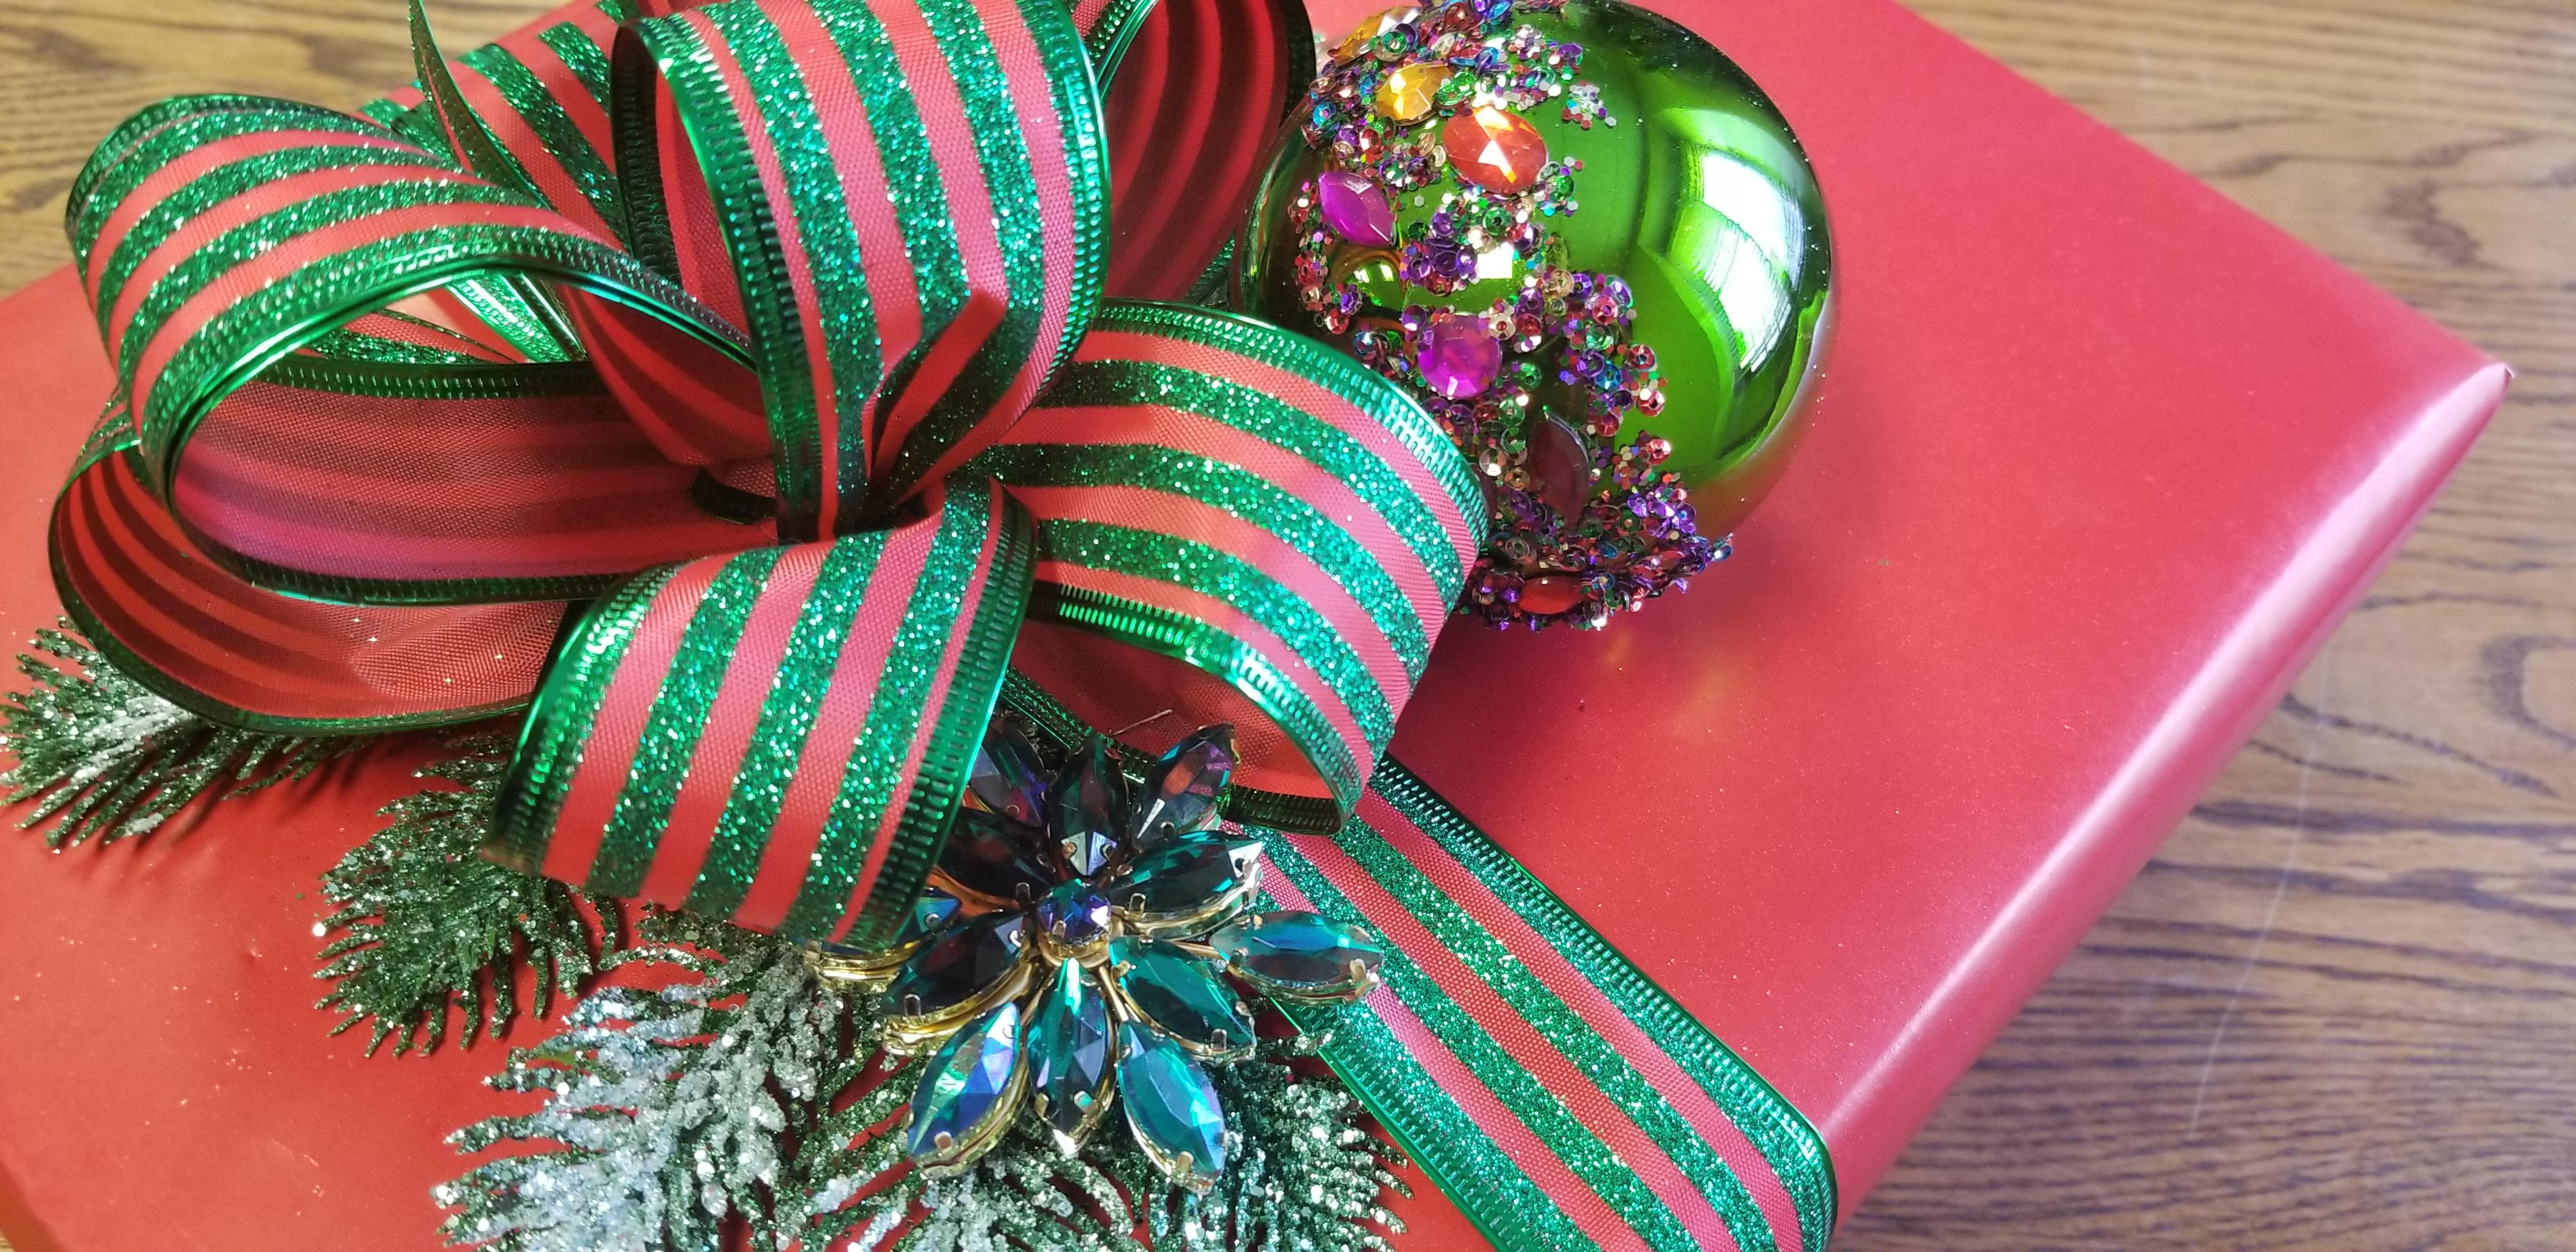 Gift Wrap Tips Inspiration Merrifield Garden Center